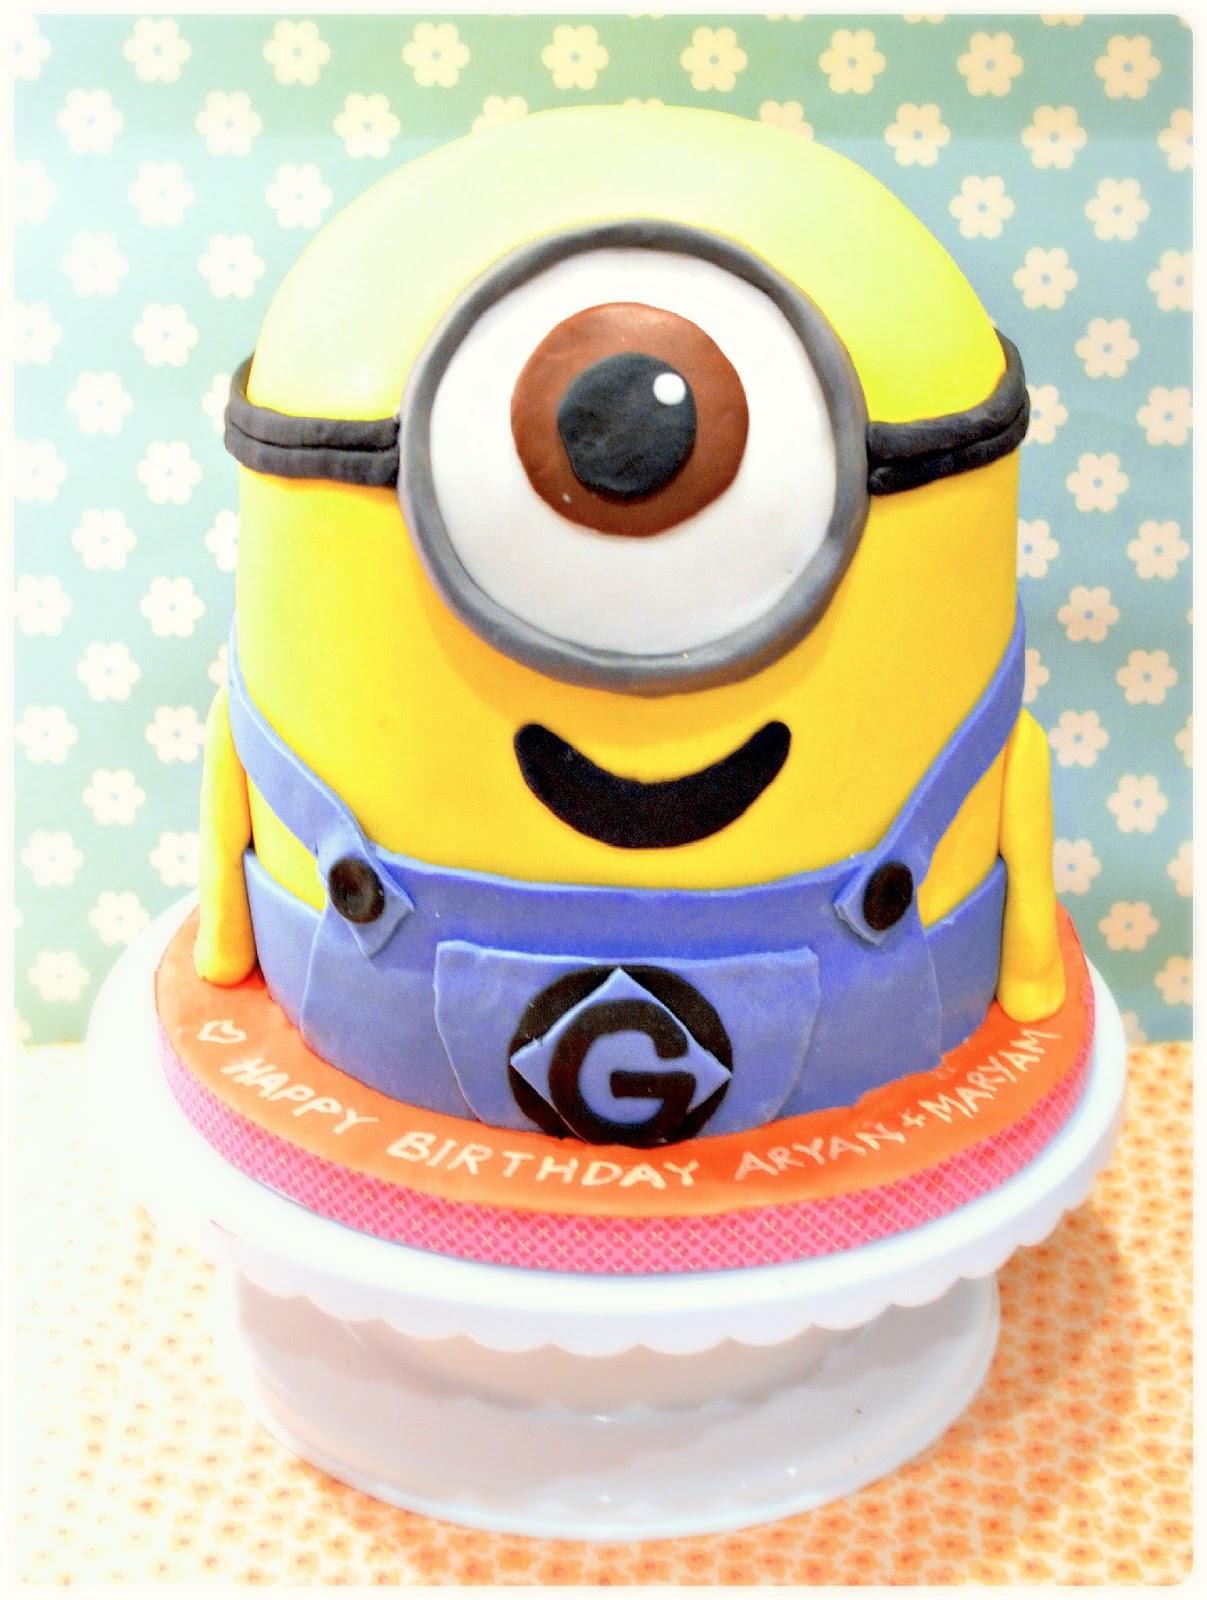 Despicable Me 2 Minion Birthday Cake London Cherie Kelly